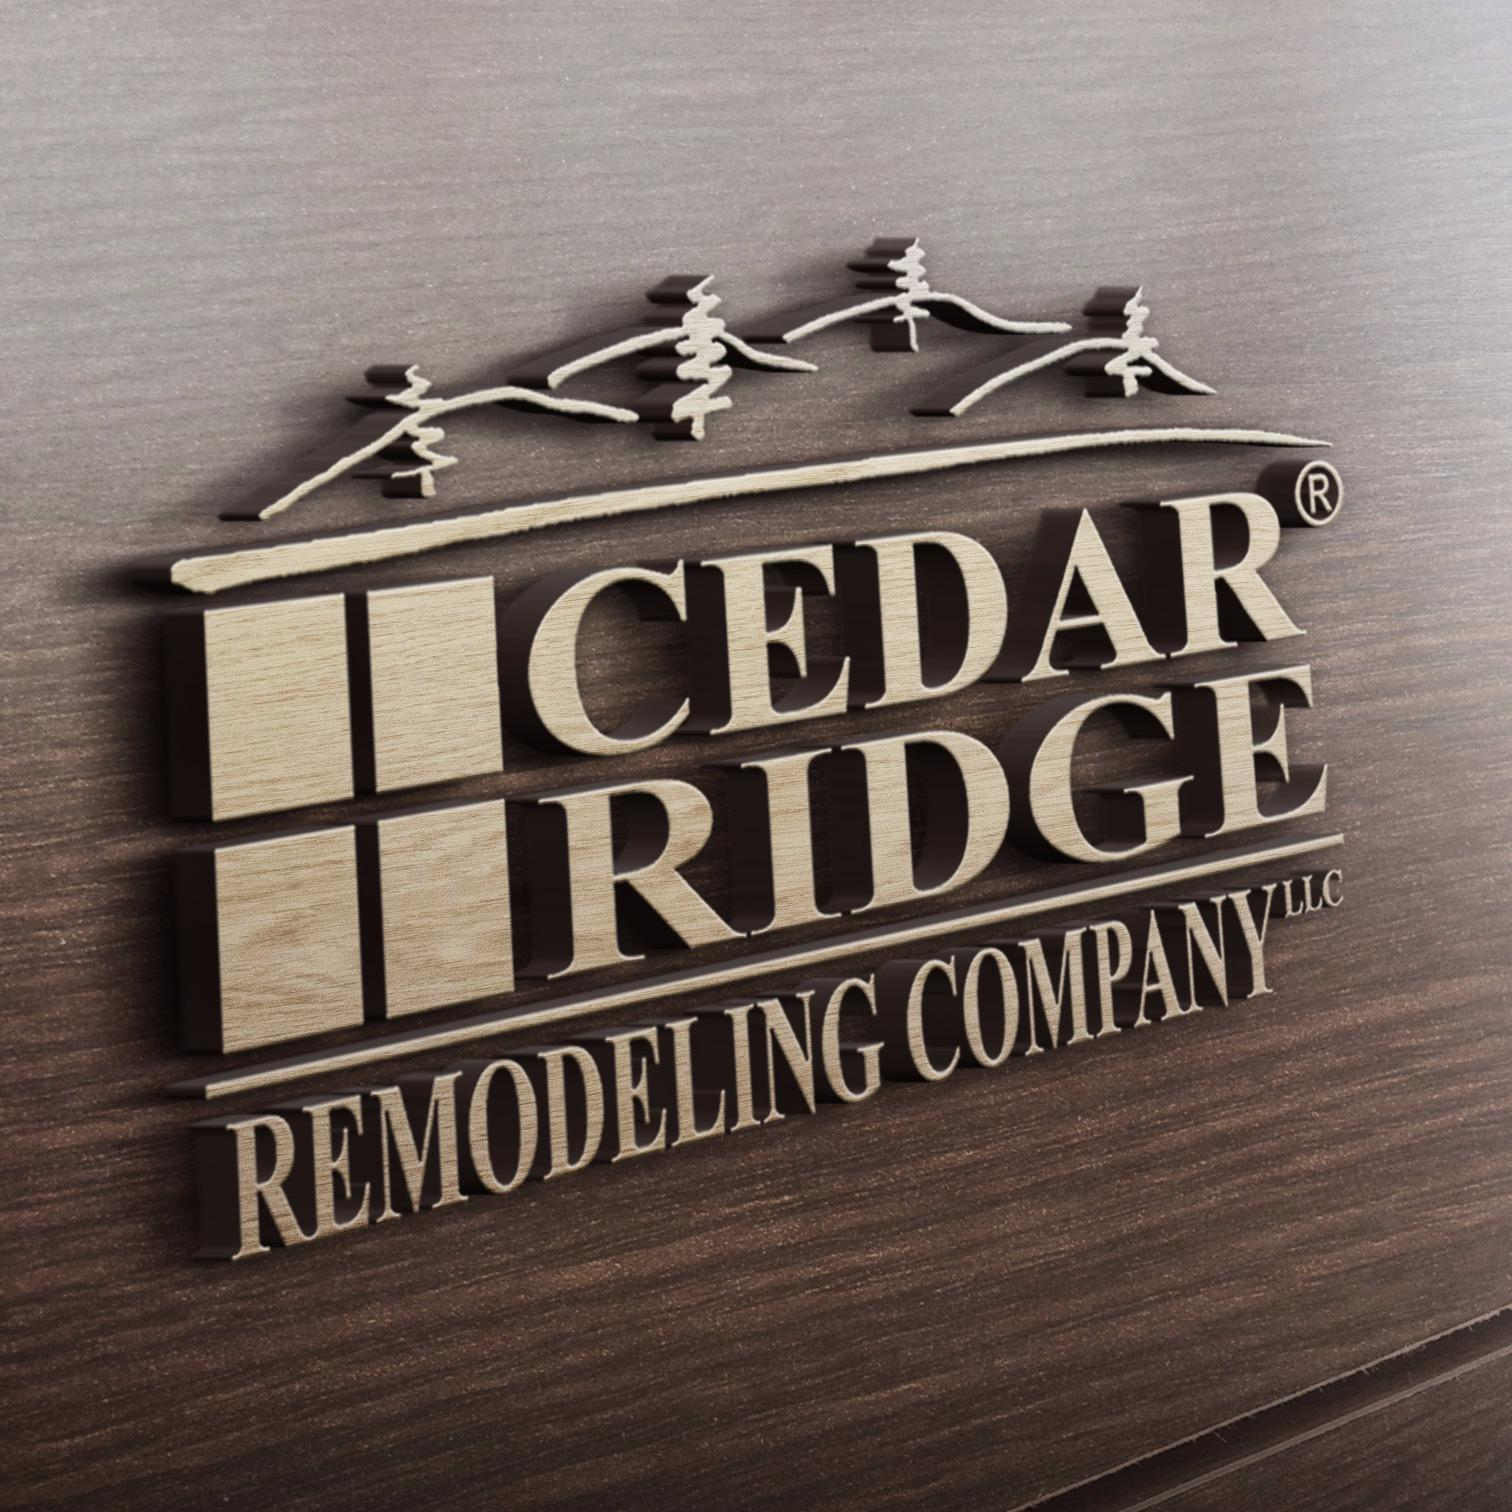 Cedar ridge remodeling company in gaithersburg md 20882 for Ceder ridge